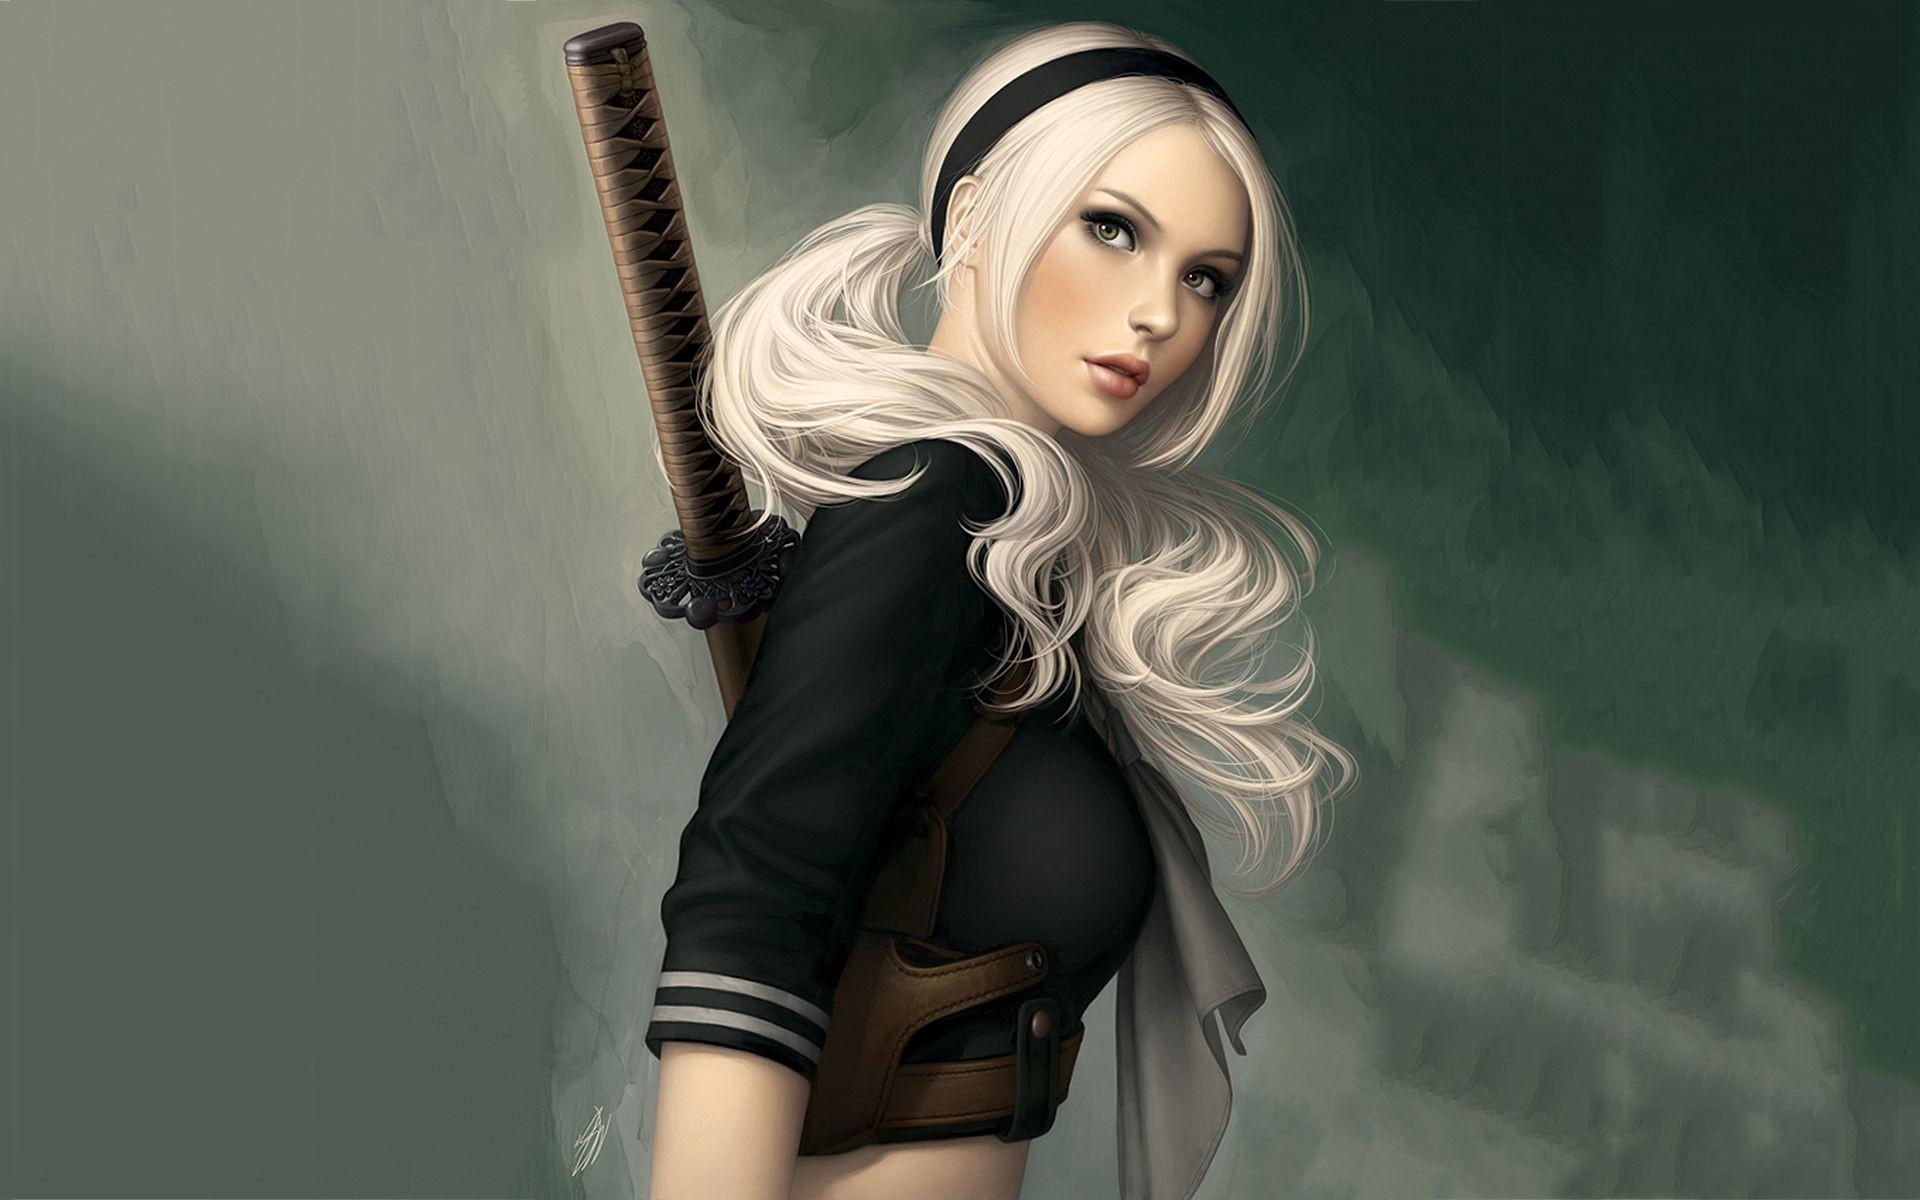 Res: 1920x1200, Samurai Blonde Girl Wallpapers - http://hdwallpapersf.com/samurai-blonde- girl-wallpapers